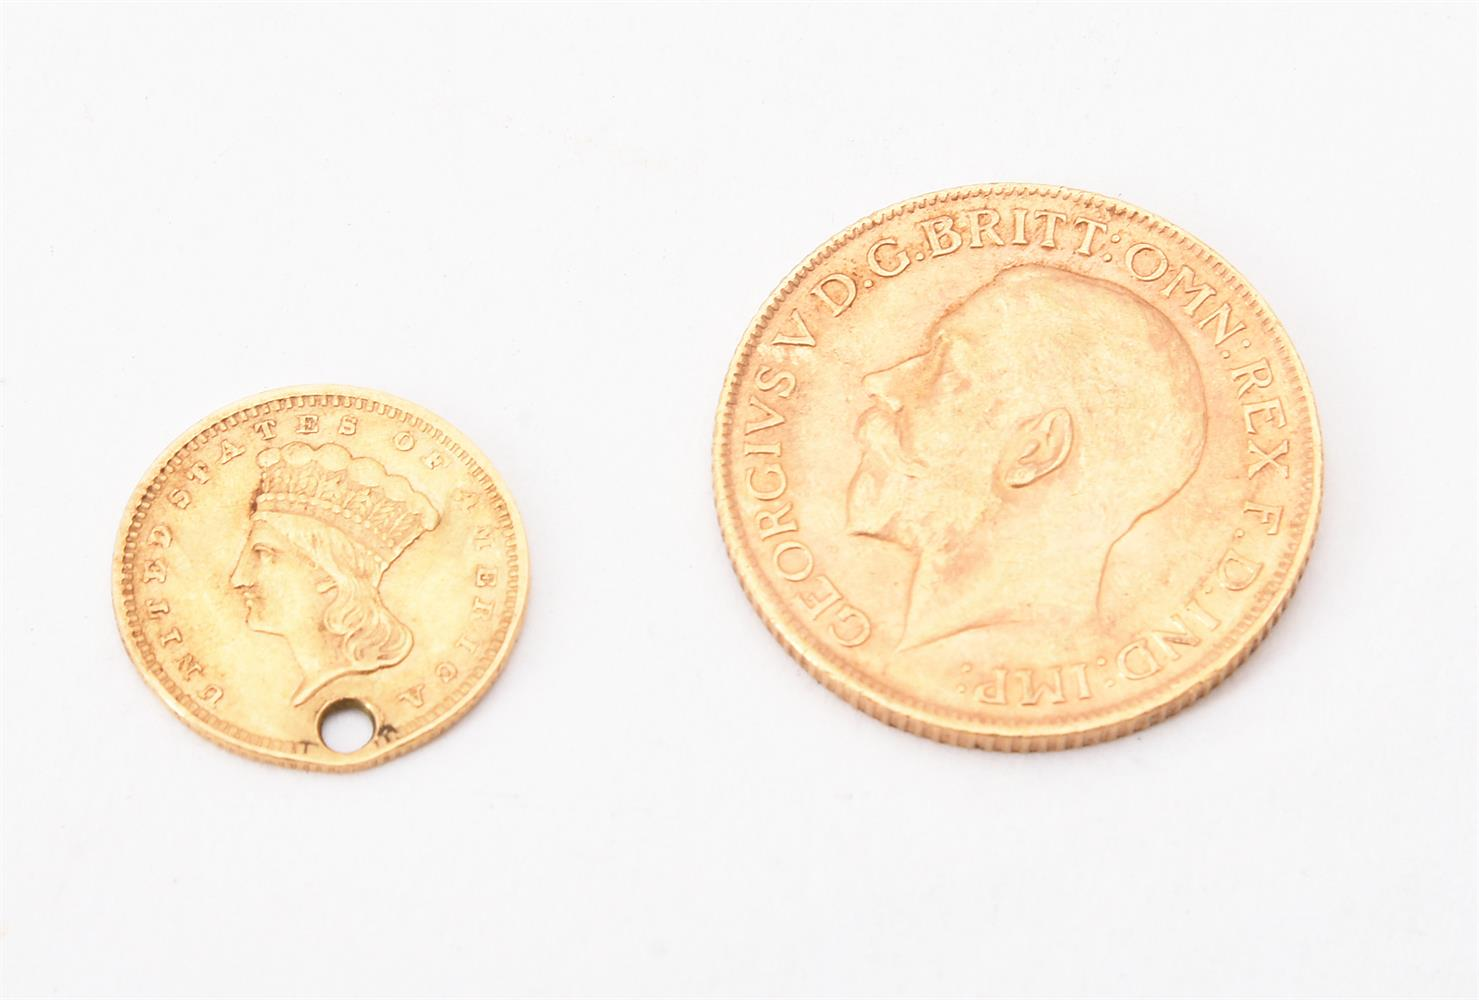 George V, Sovereign 1914 - Image 2 of 2